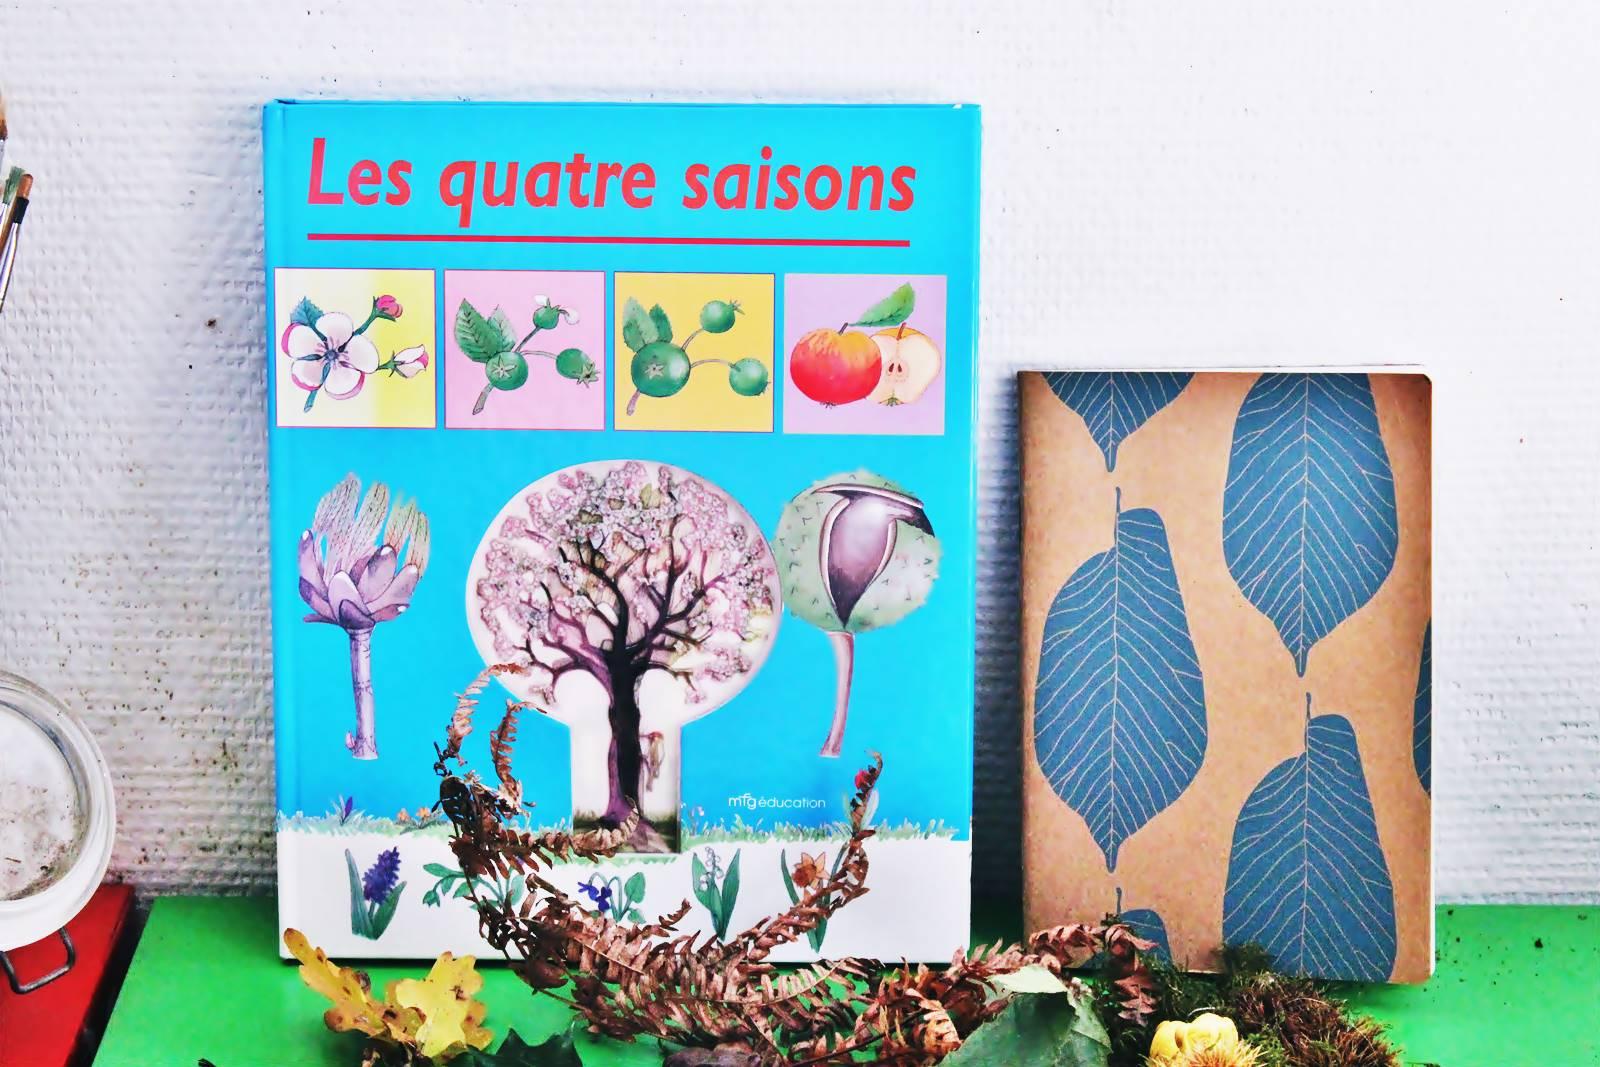 Table des saisons steiner waldorf ief homescooling ecole maison automne 4